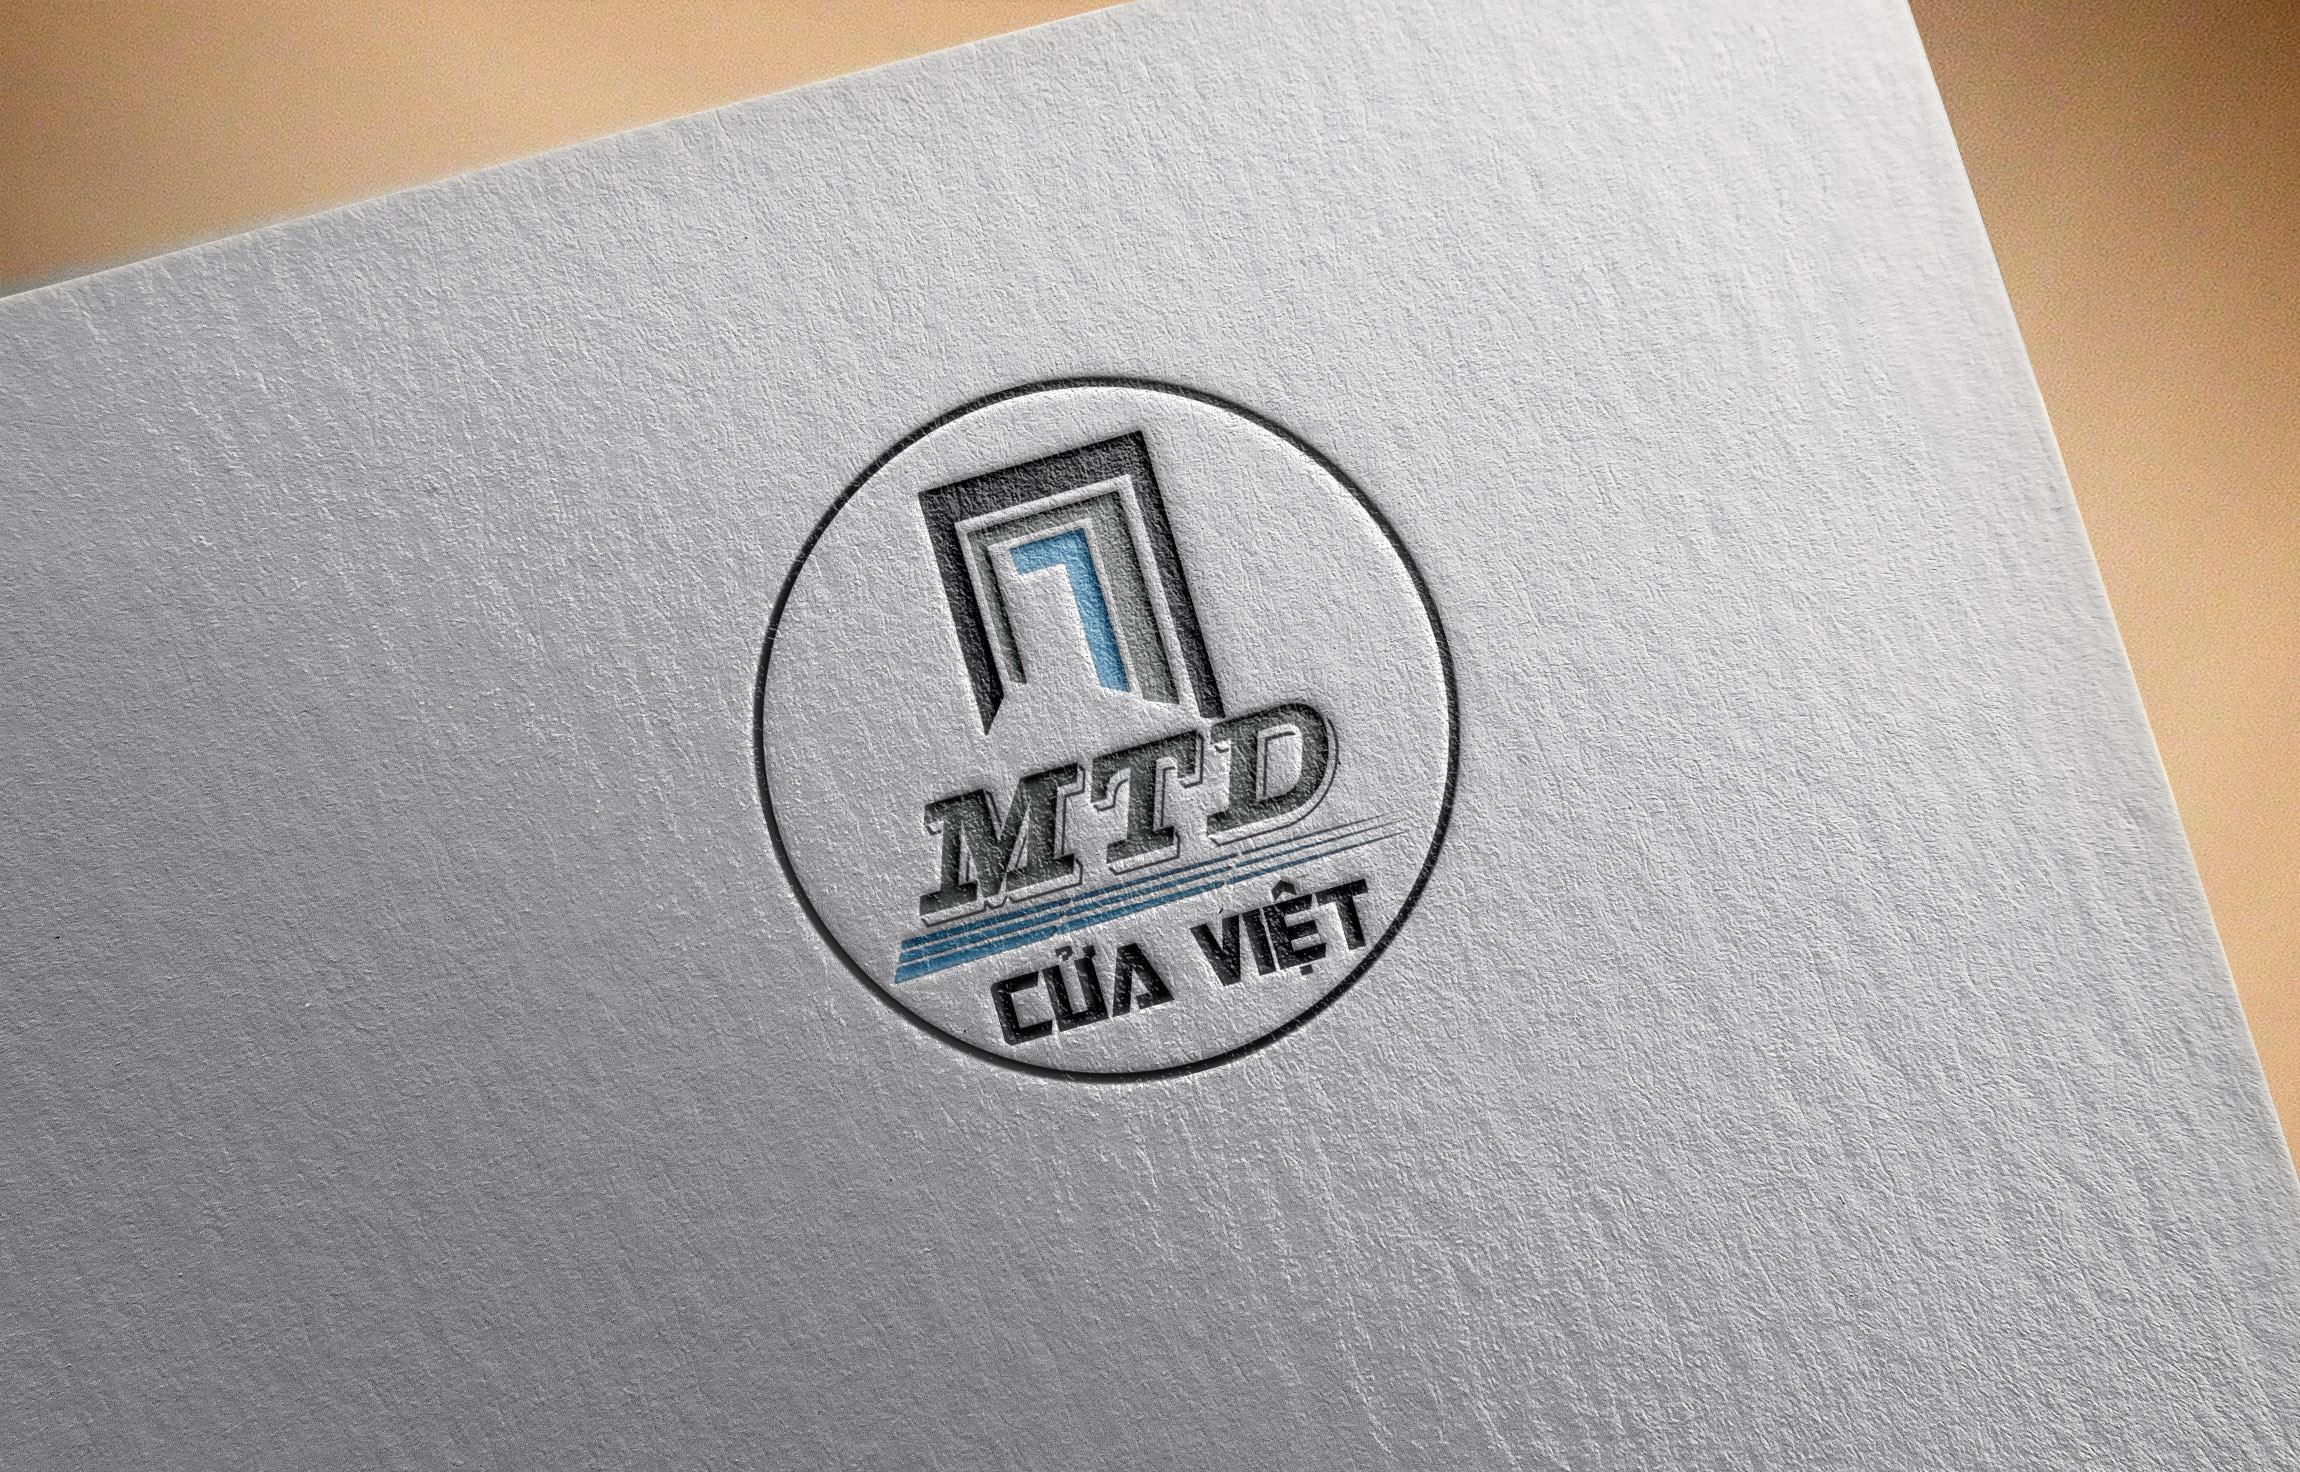 Thiết kế logo MTD 2